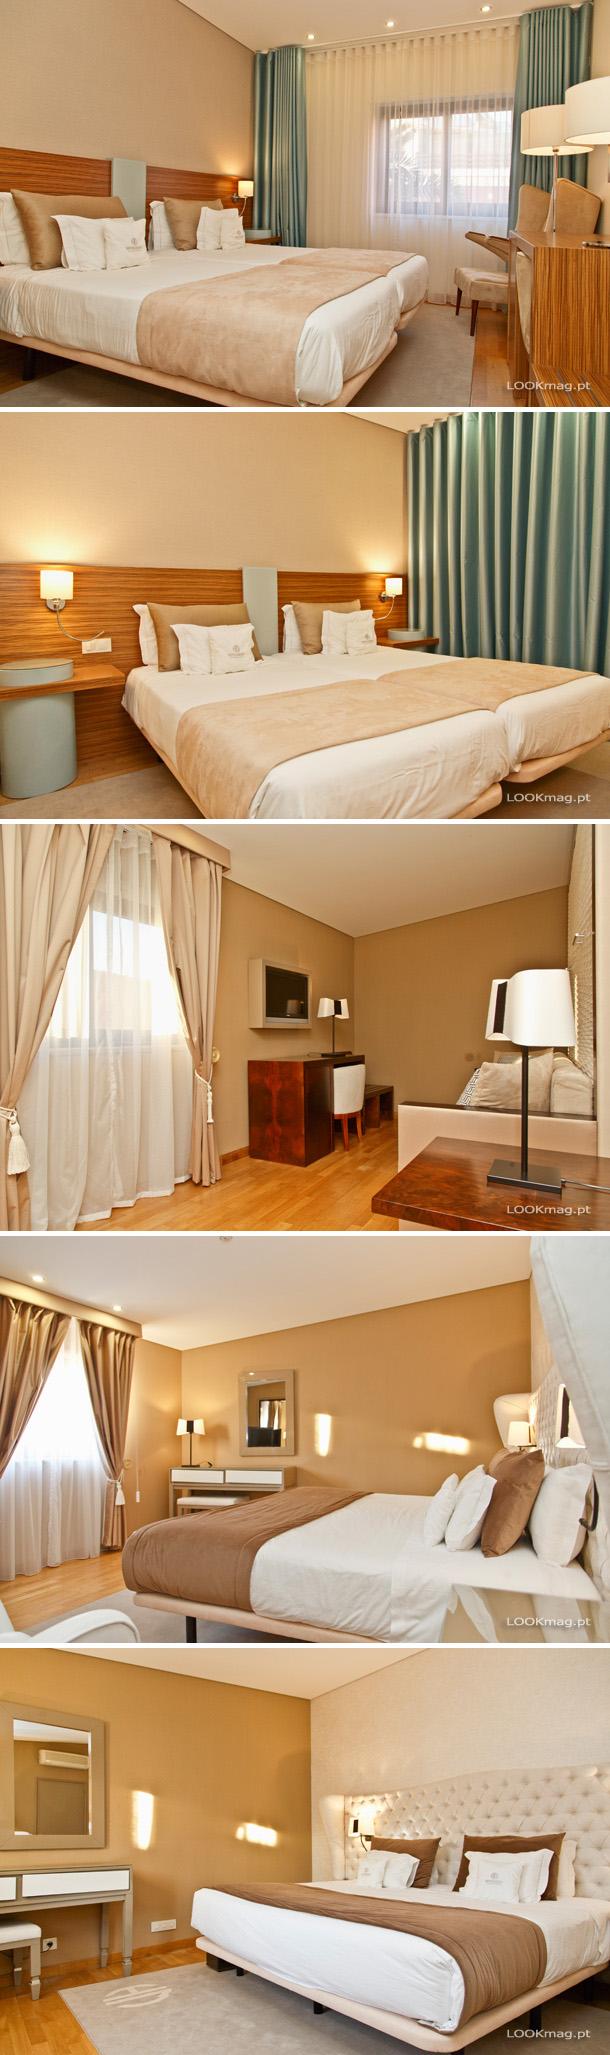 hotel_meira-lookmag_pt-11_15